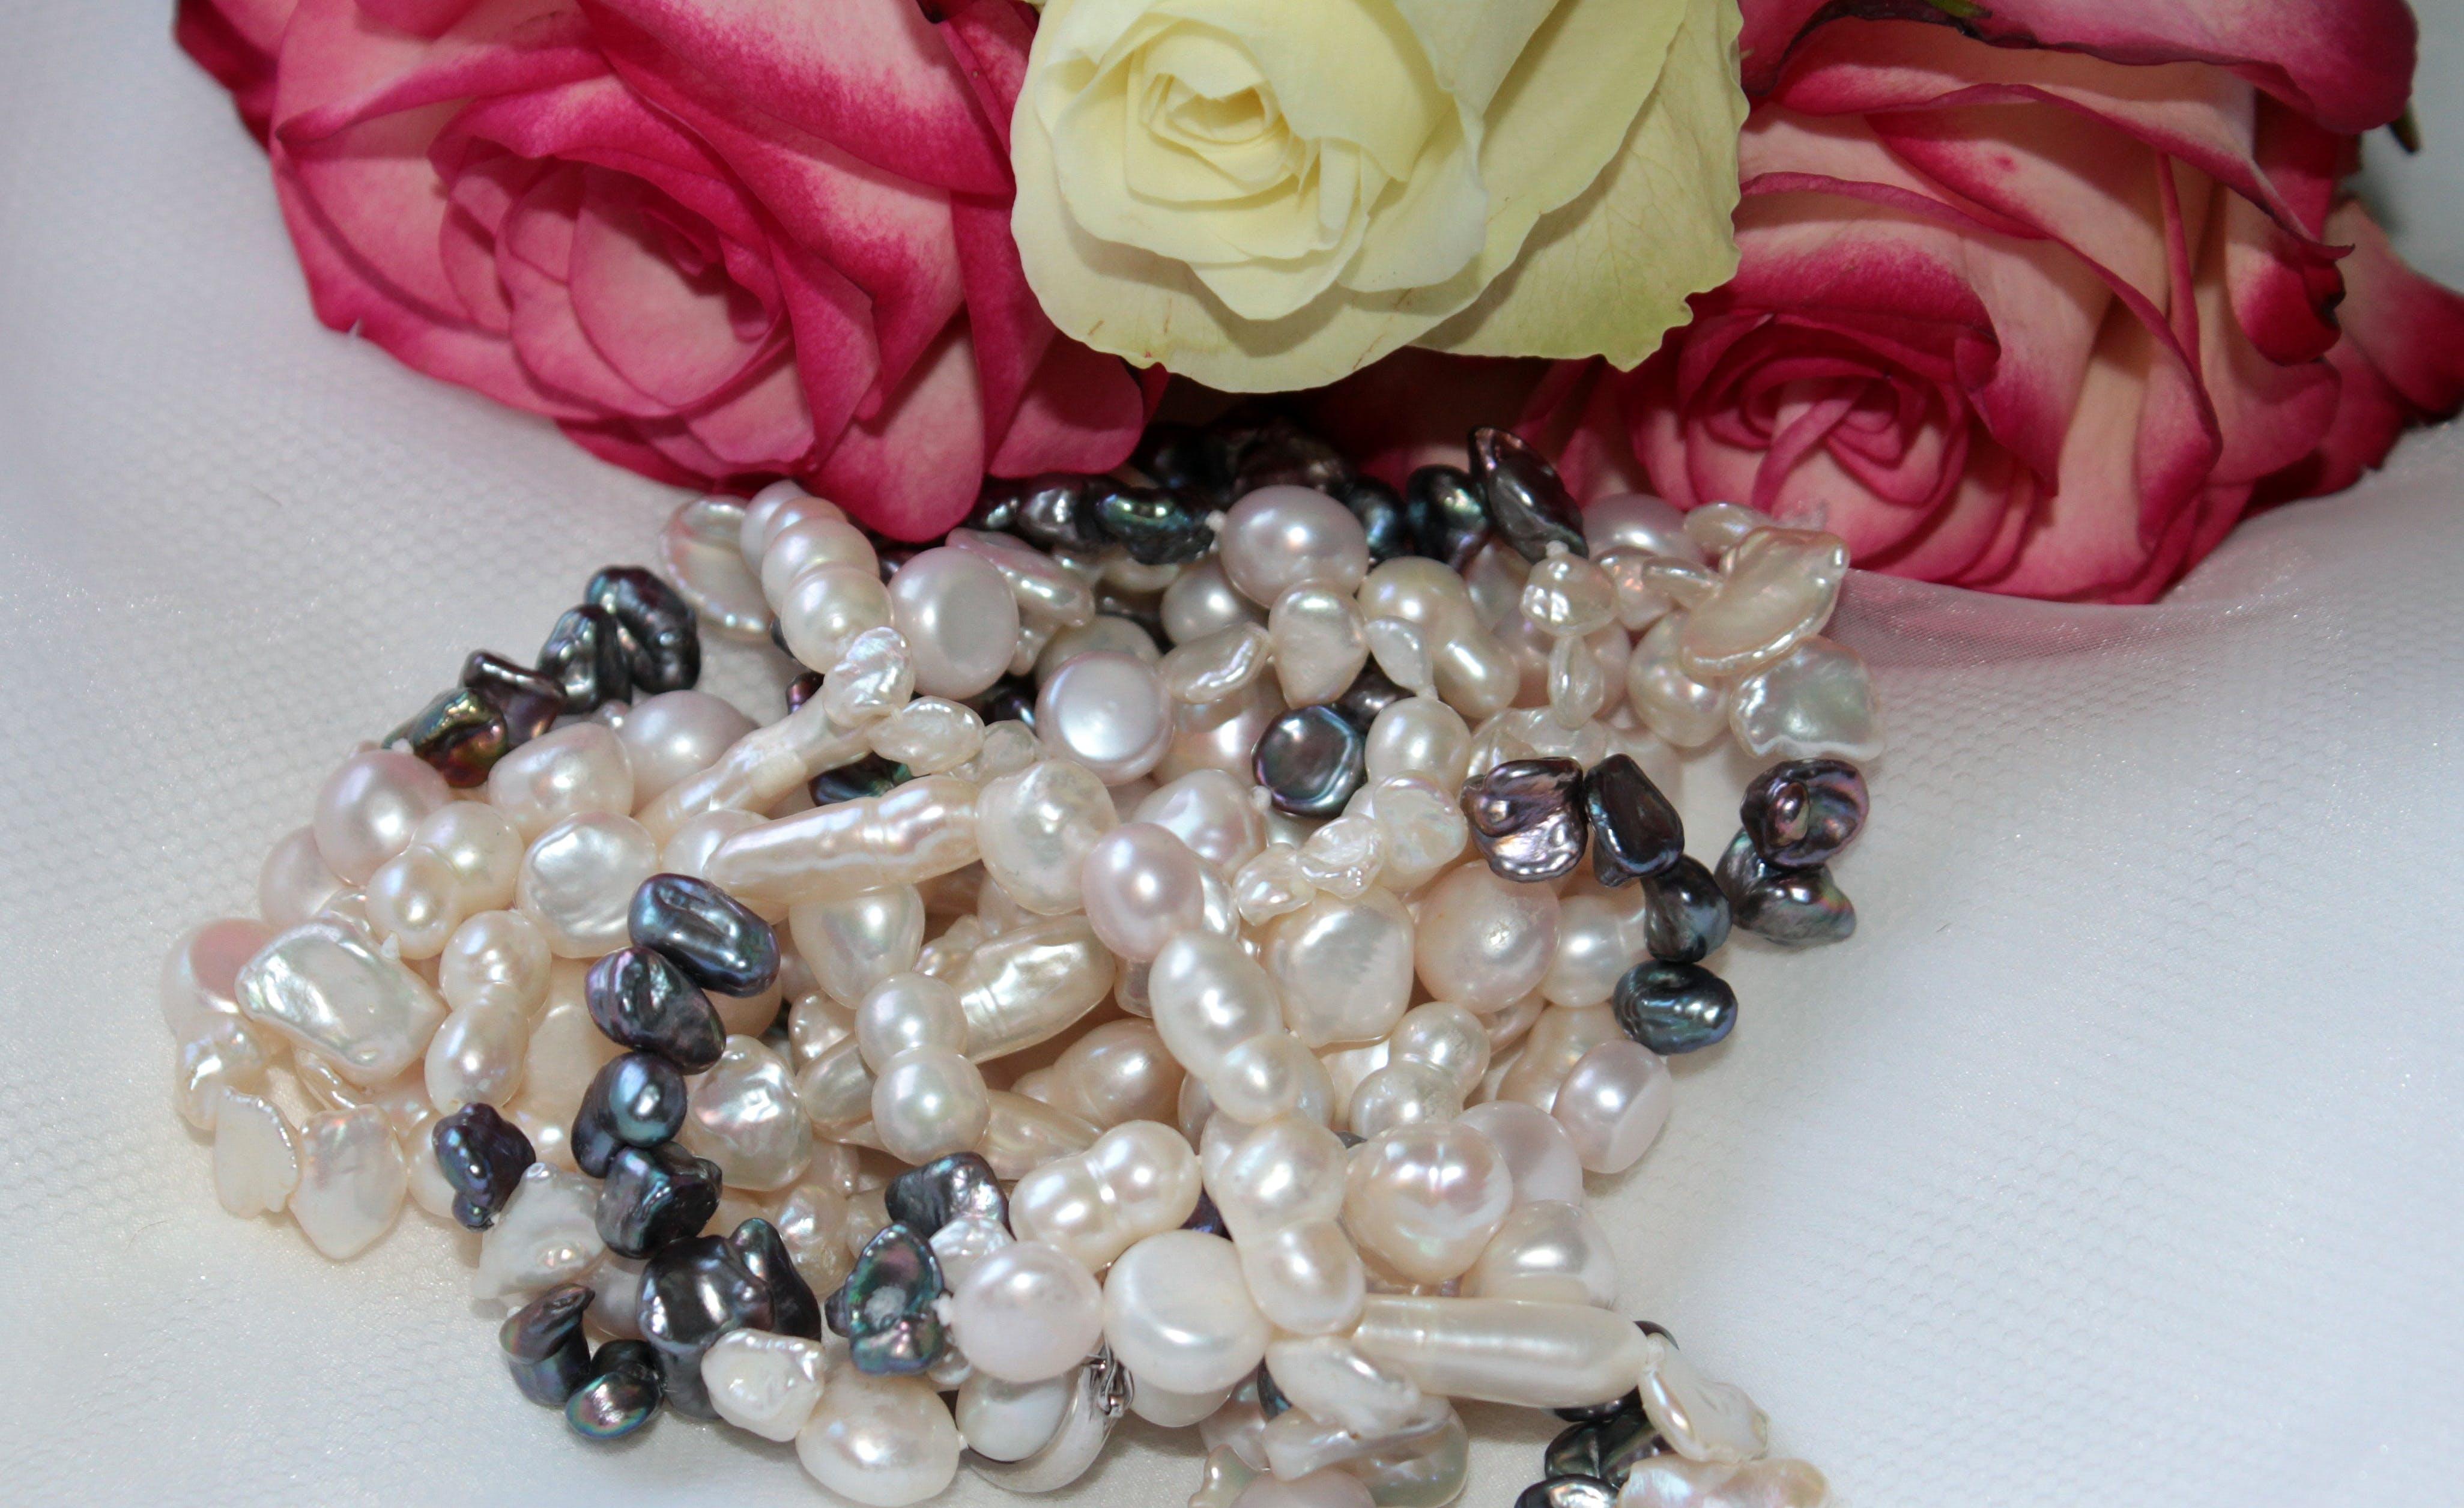 Free stock photo of chain, gift, gloss, jewellery